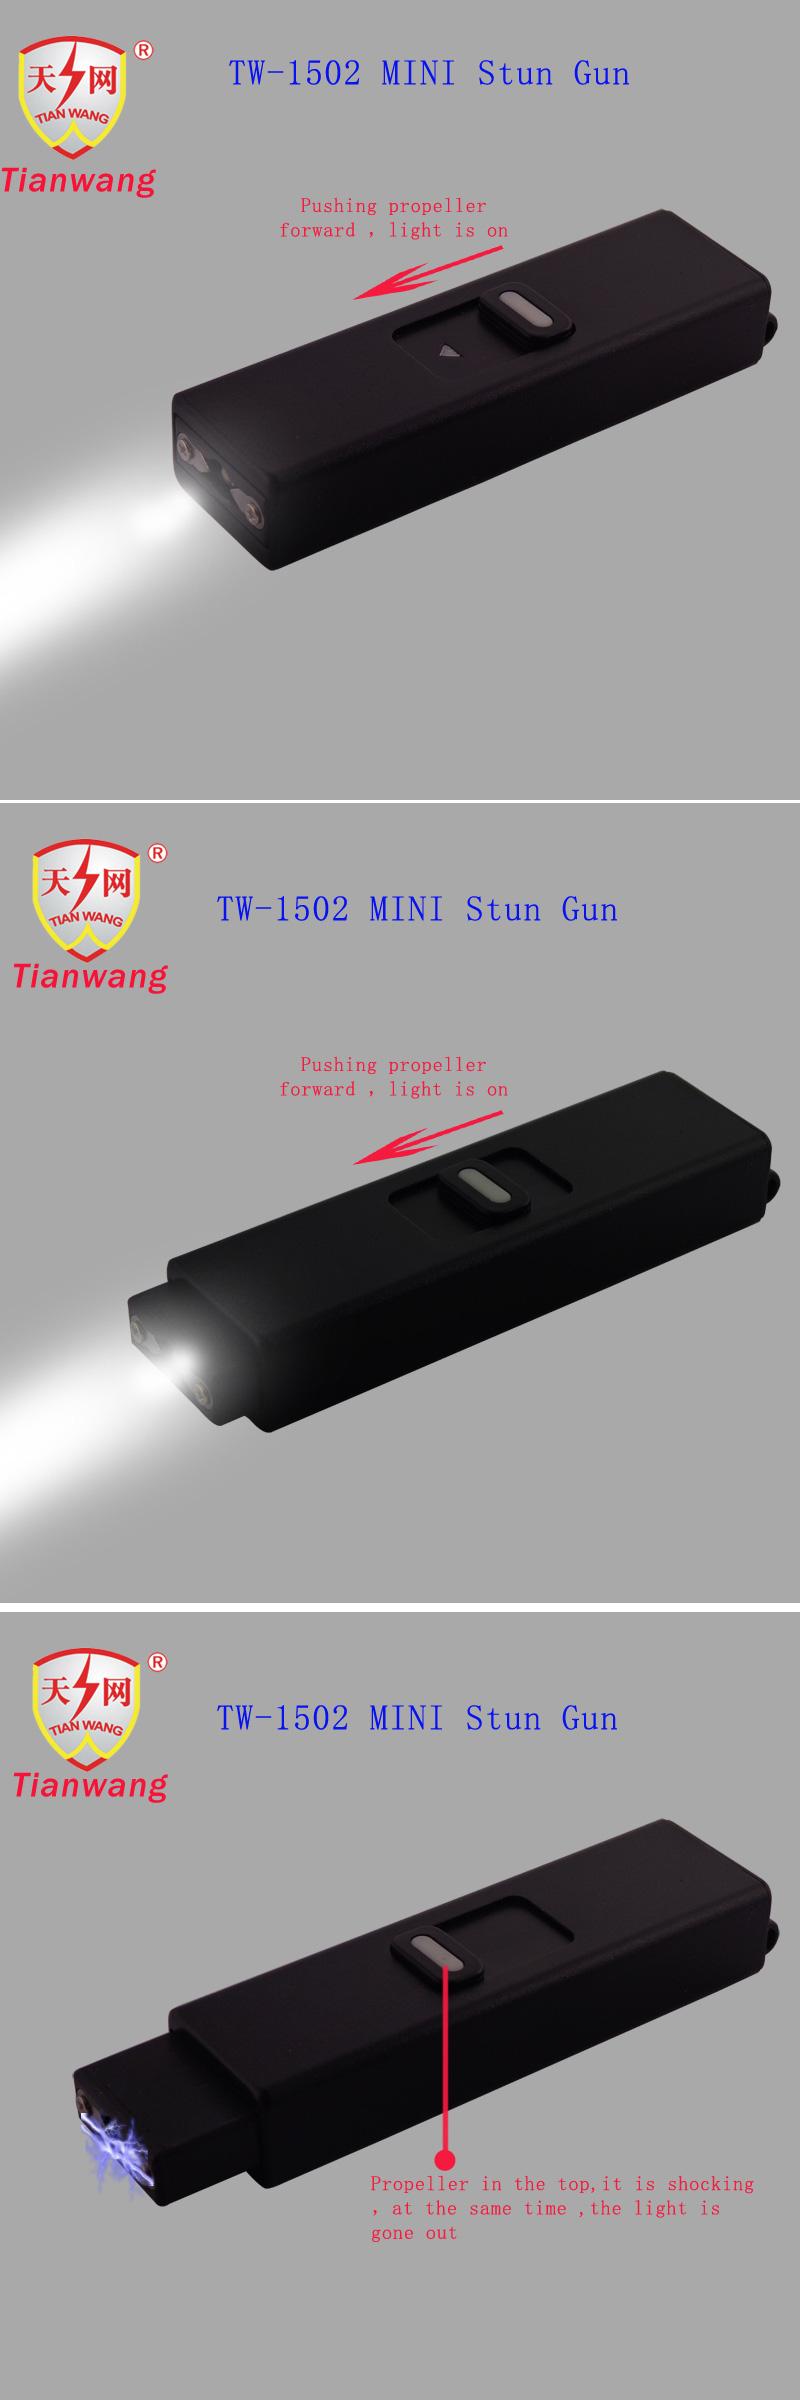 Miniature Stun Guns with Flashlight Cheap (TW-1502)